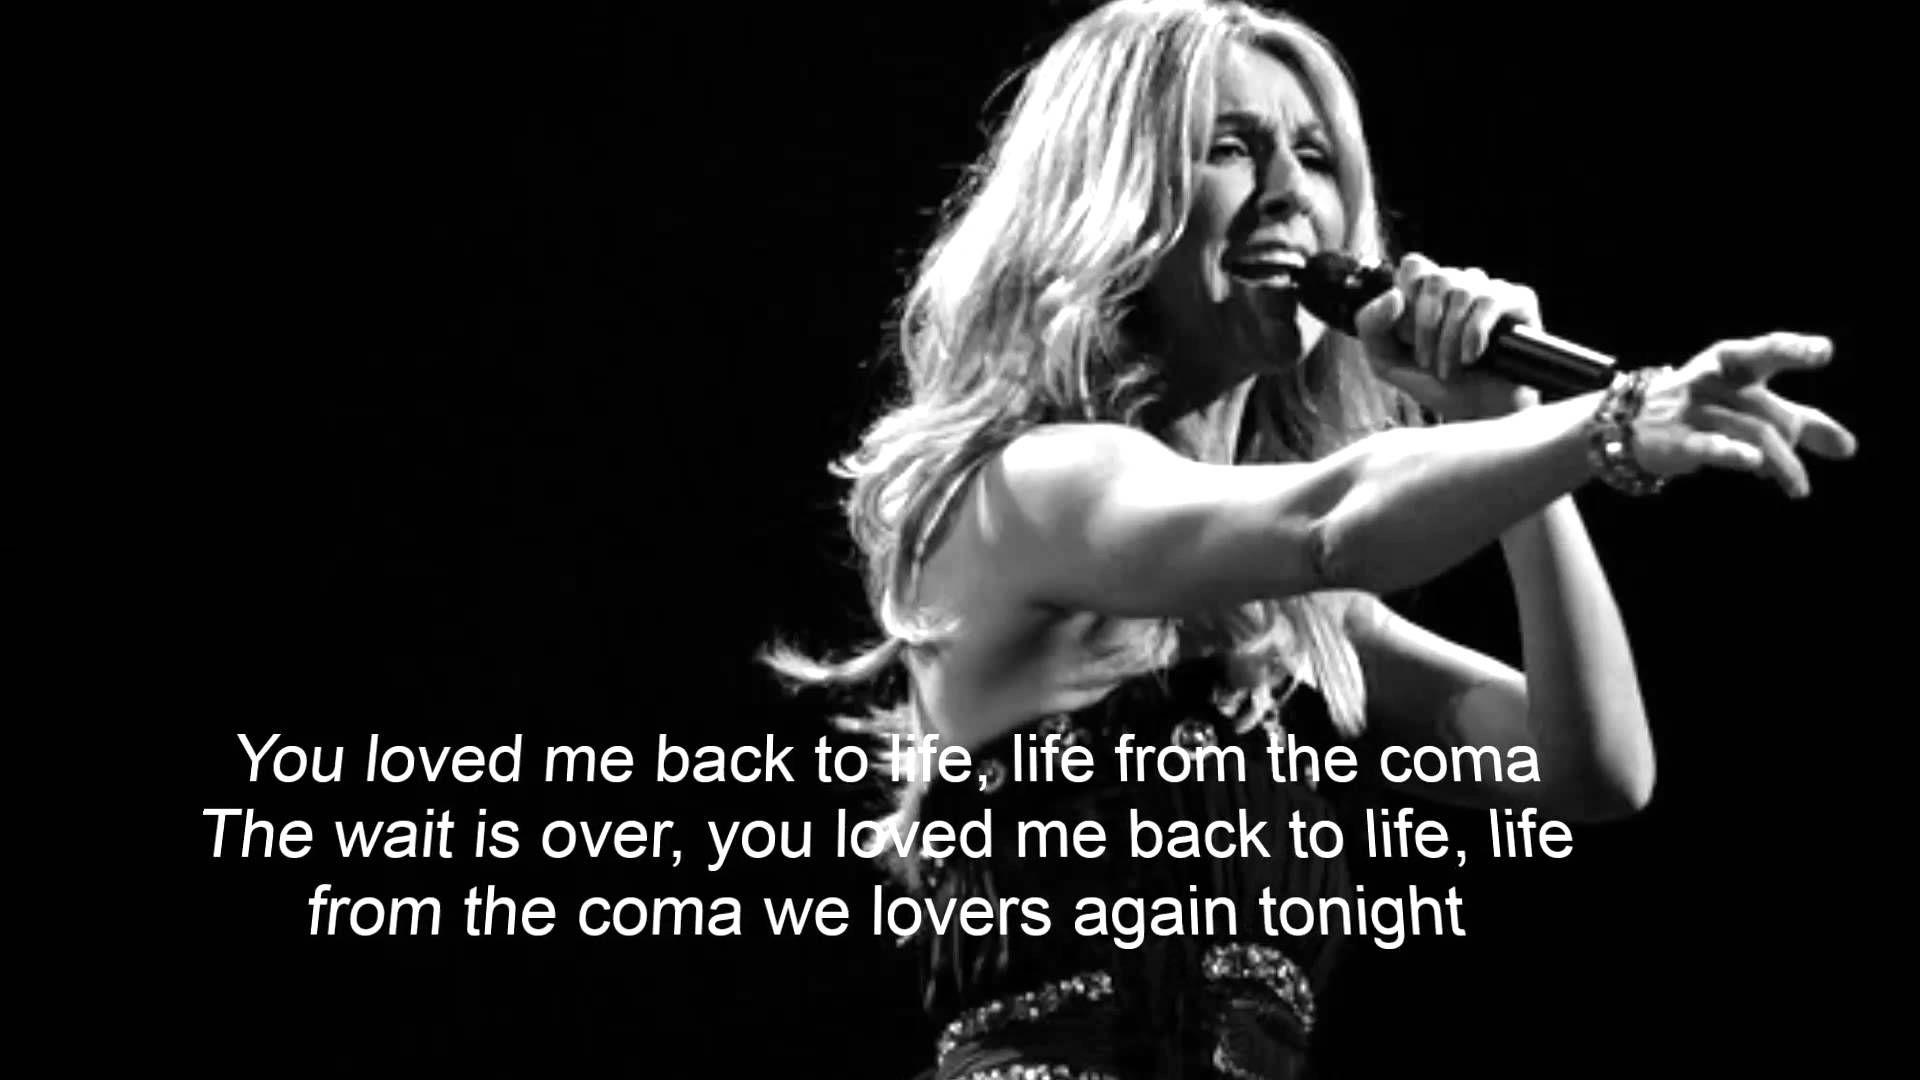 Celine Dion Loved Me Back To Life Lyrics Celine Dion Life Lyrics Music Videos